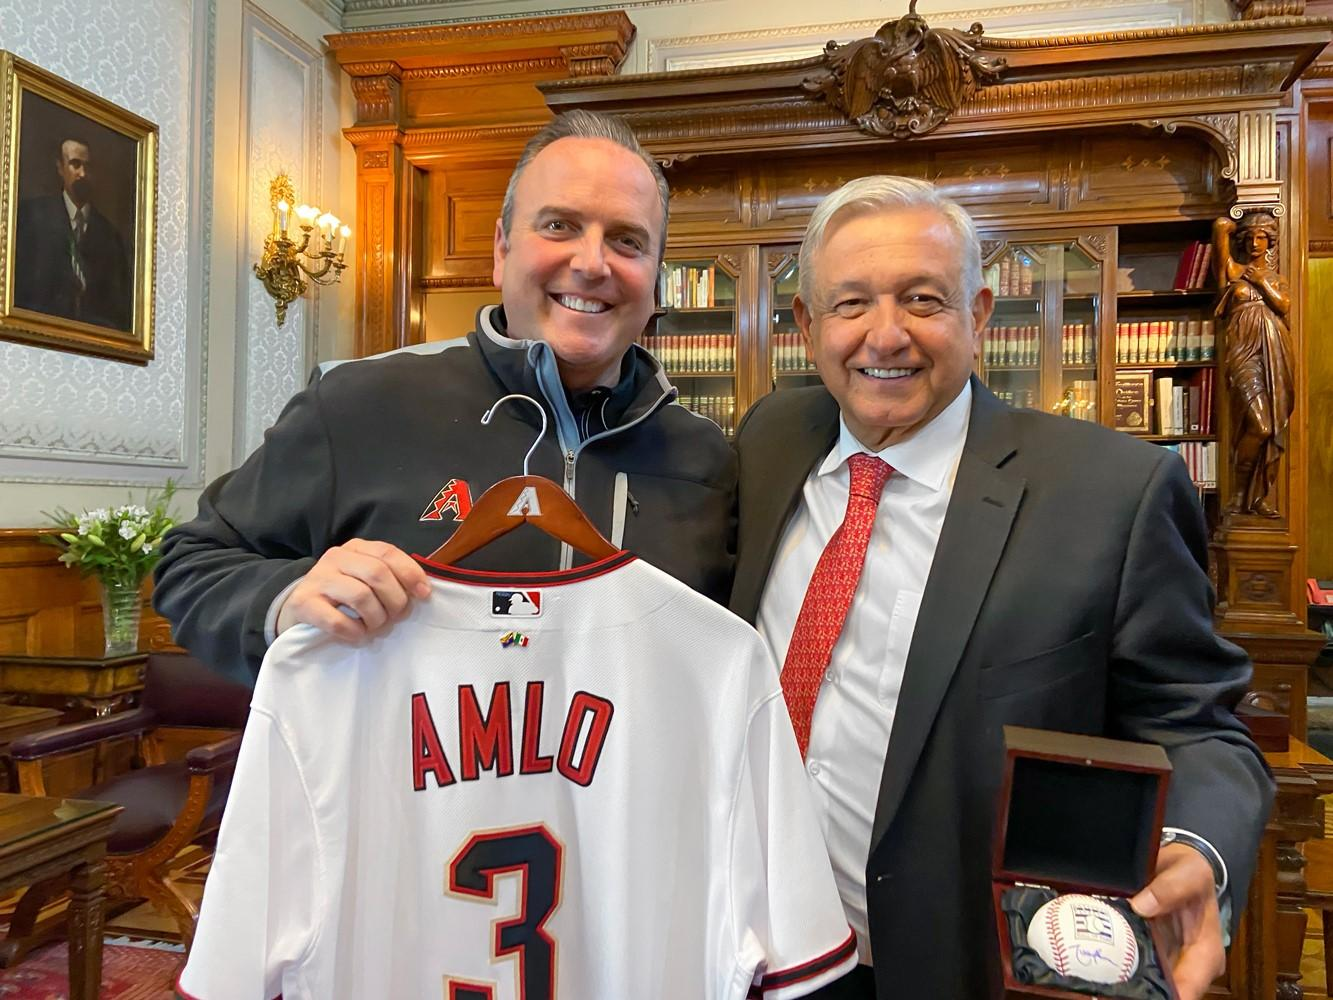 Derrick Hall, president and CEO of the Diamondbacks, with Mexican president Andrés Manuel López Obrador